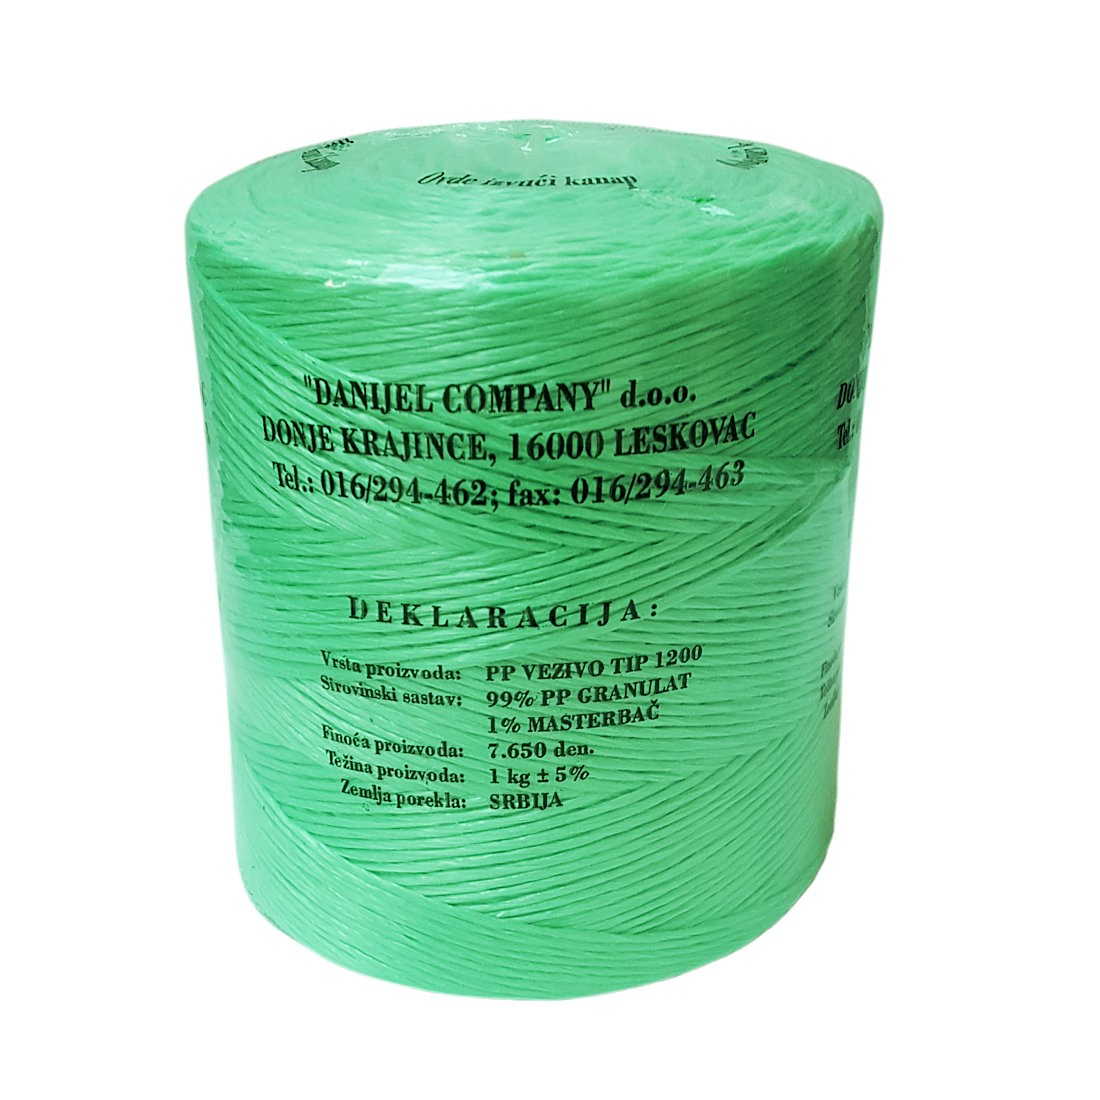 Green Polypropylene Baling Twine T-1200 1kg Spool